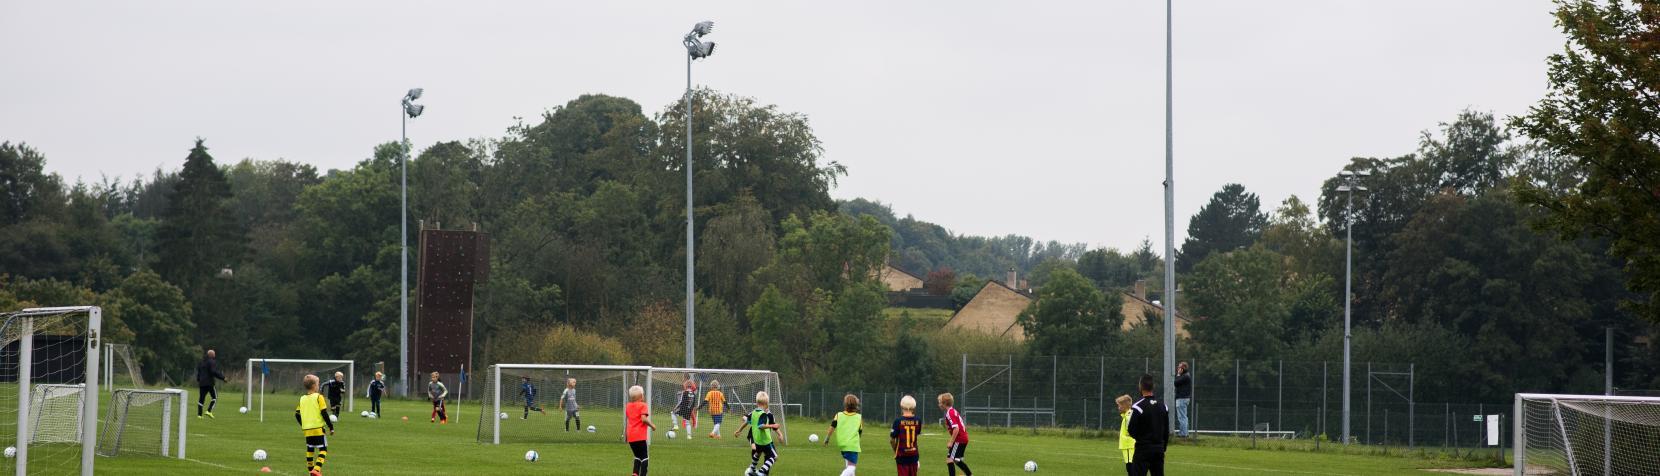 Fodbold på Rundforbi Idrætsanlæg